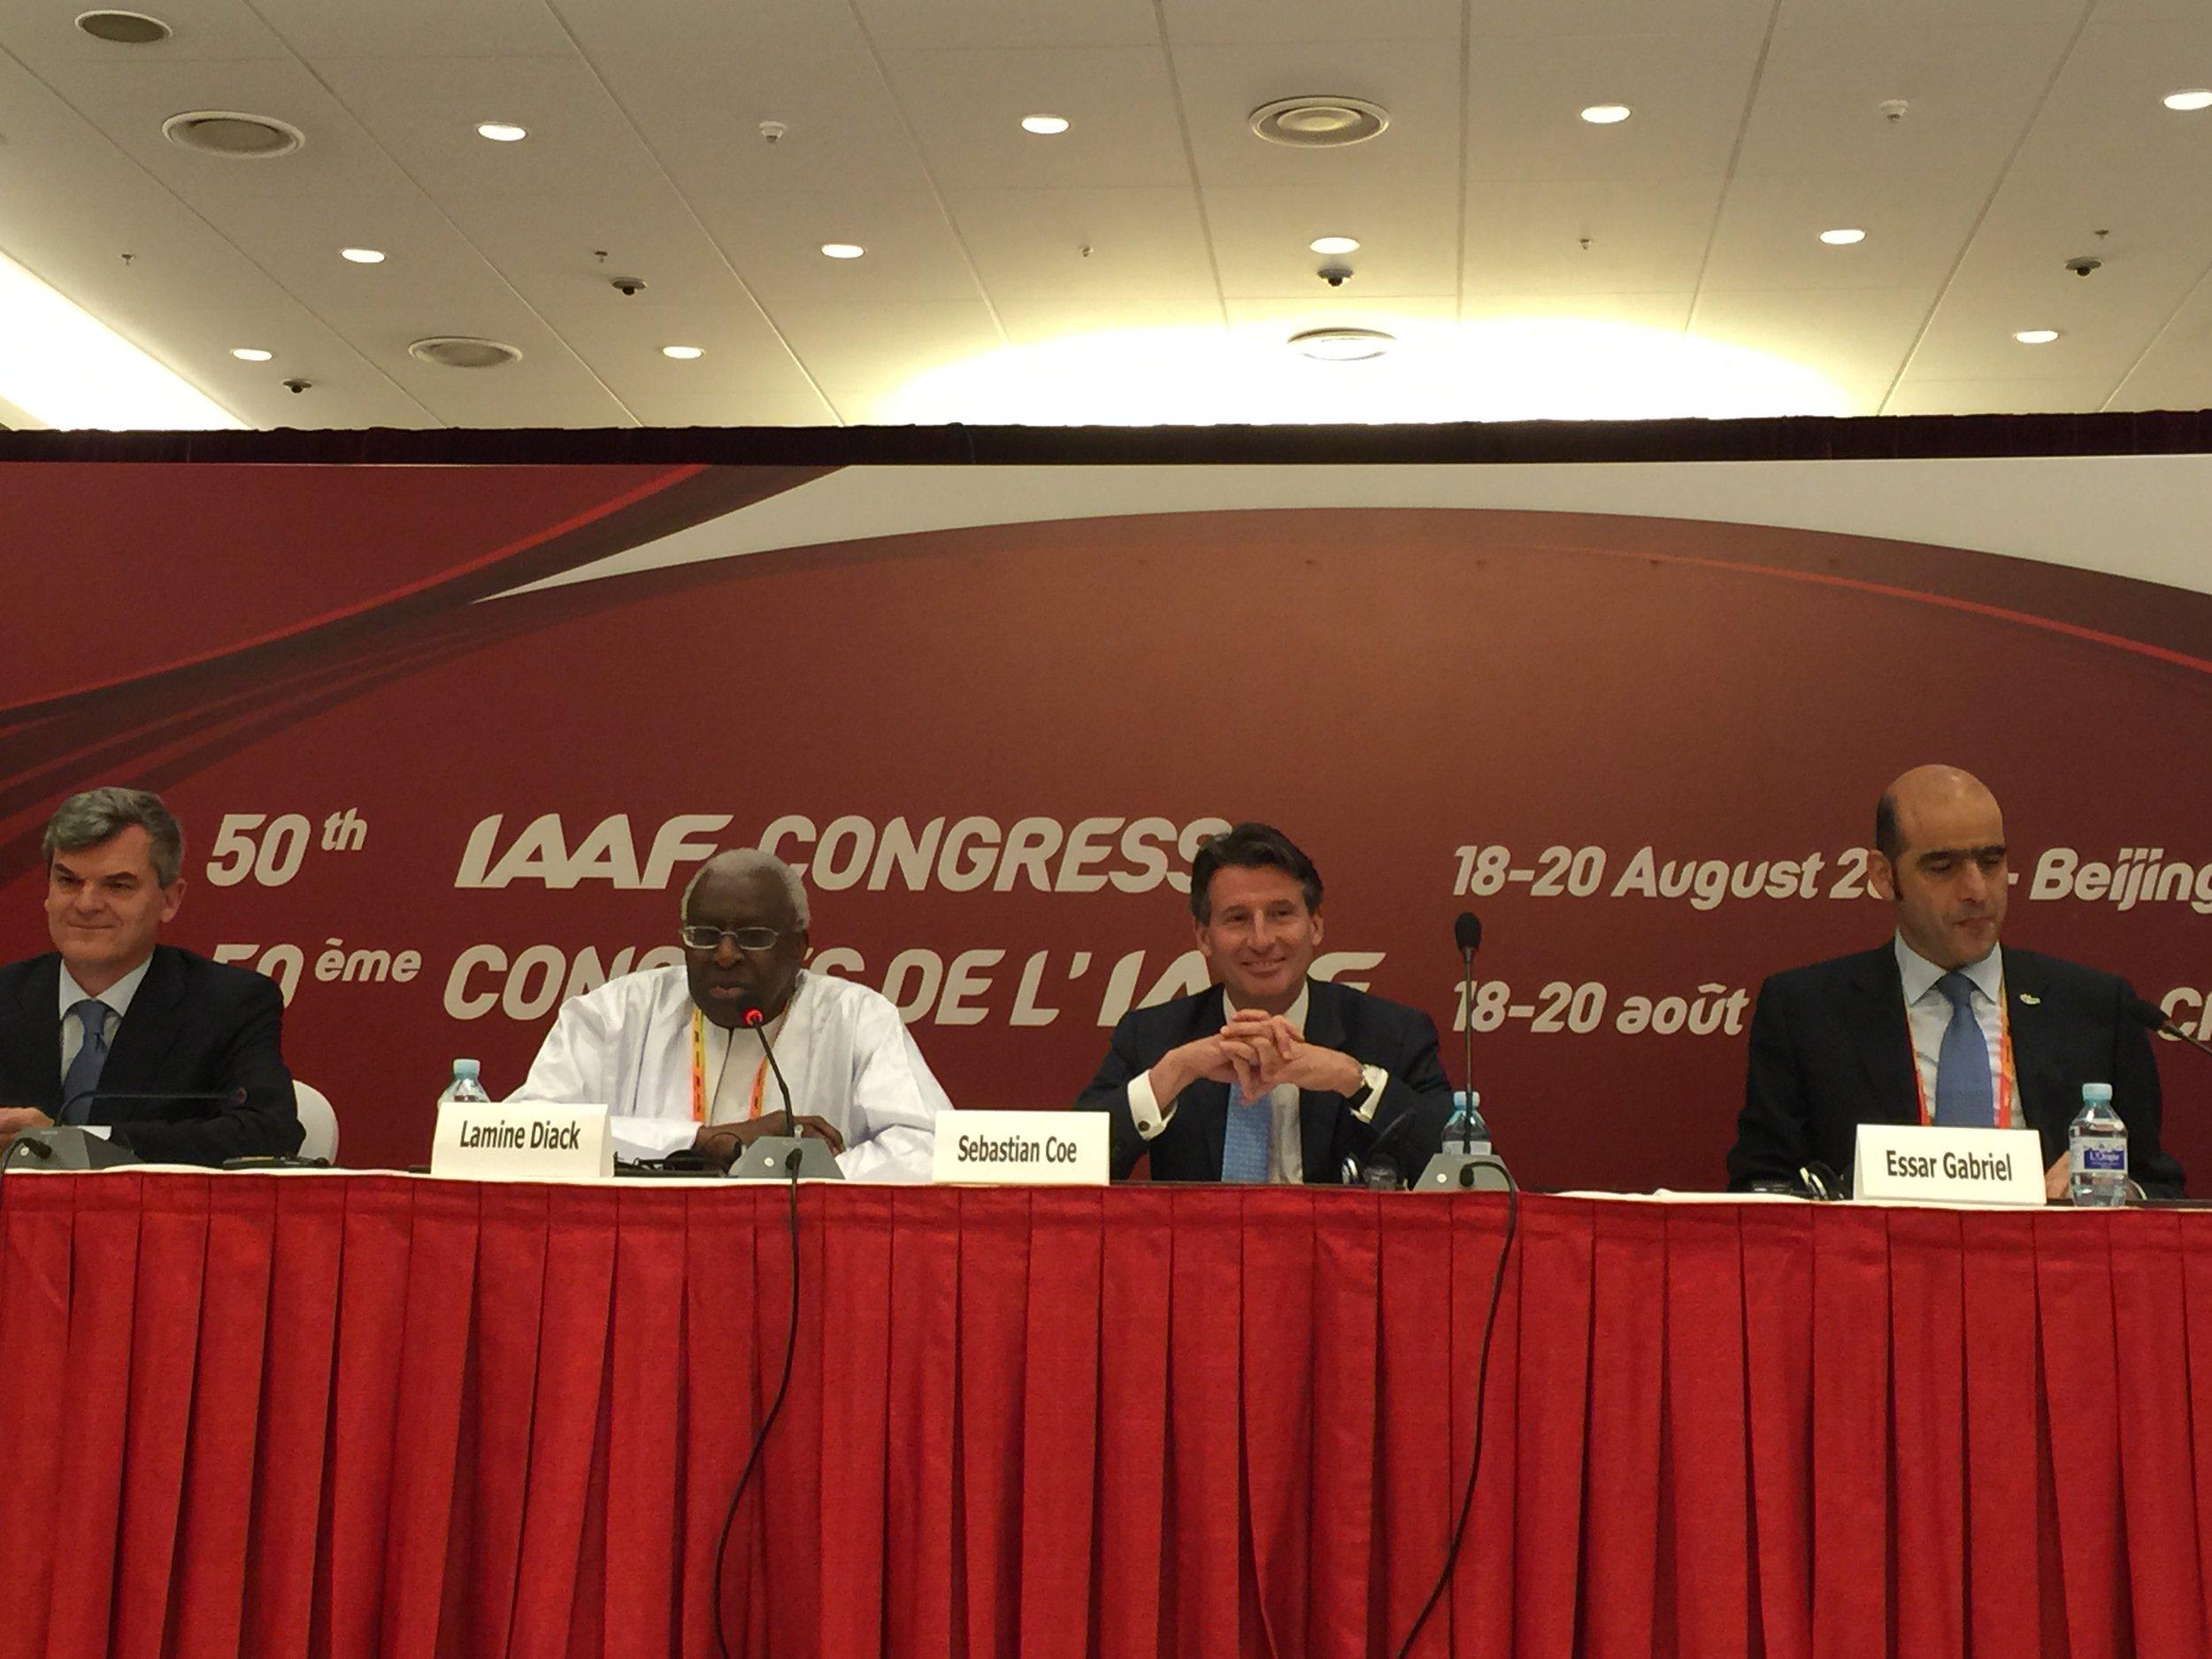 Post-election news conference: IAAF spokesman Nick Davies; president Lamine Diack; president-elect Seb Coe; general secretary Essar Gabriel